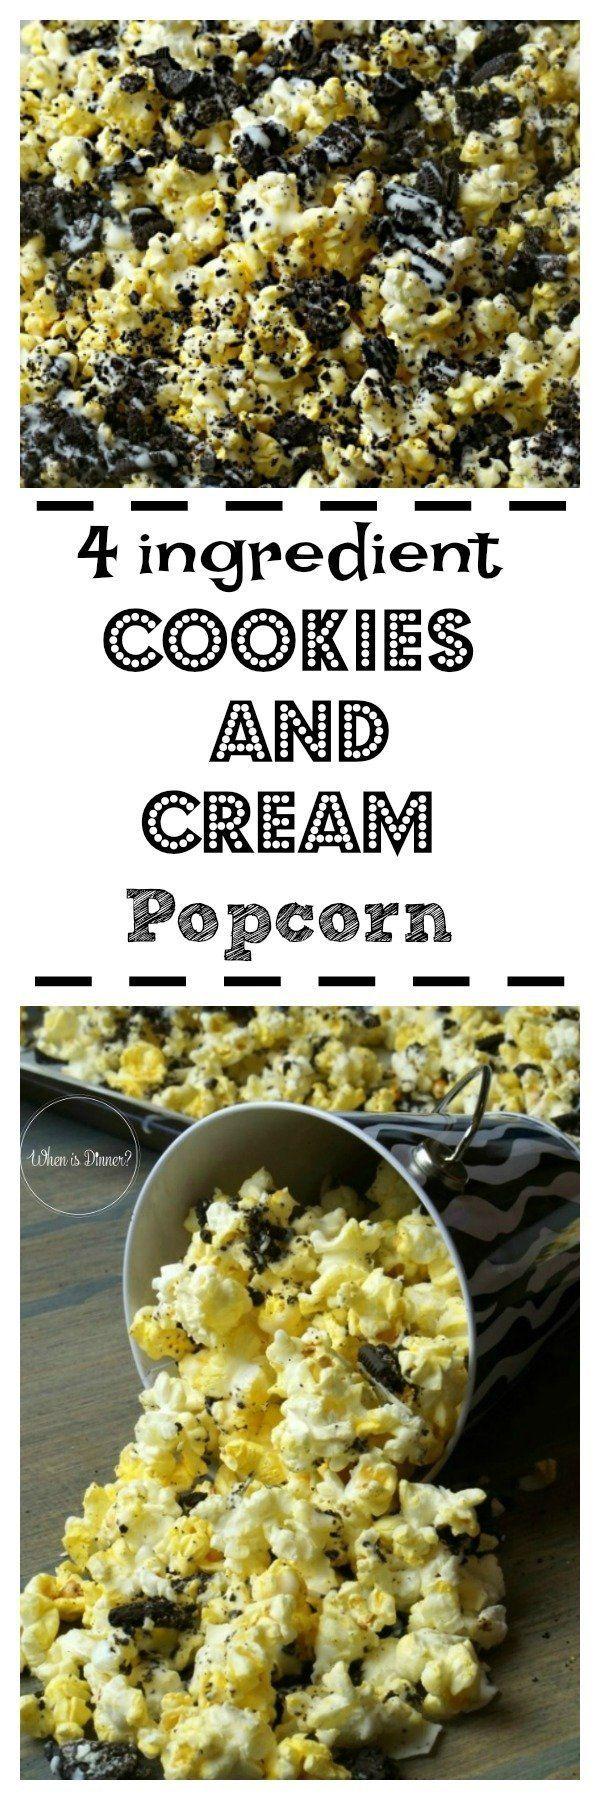 Cookies and Cream Popcorn Cookies and Cream Popcorn